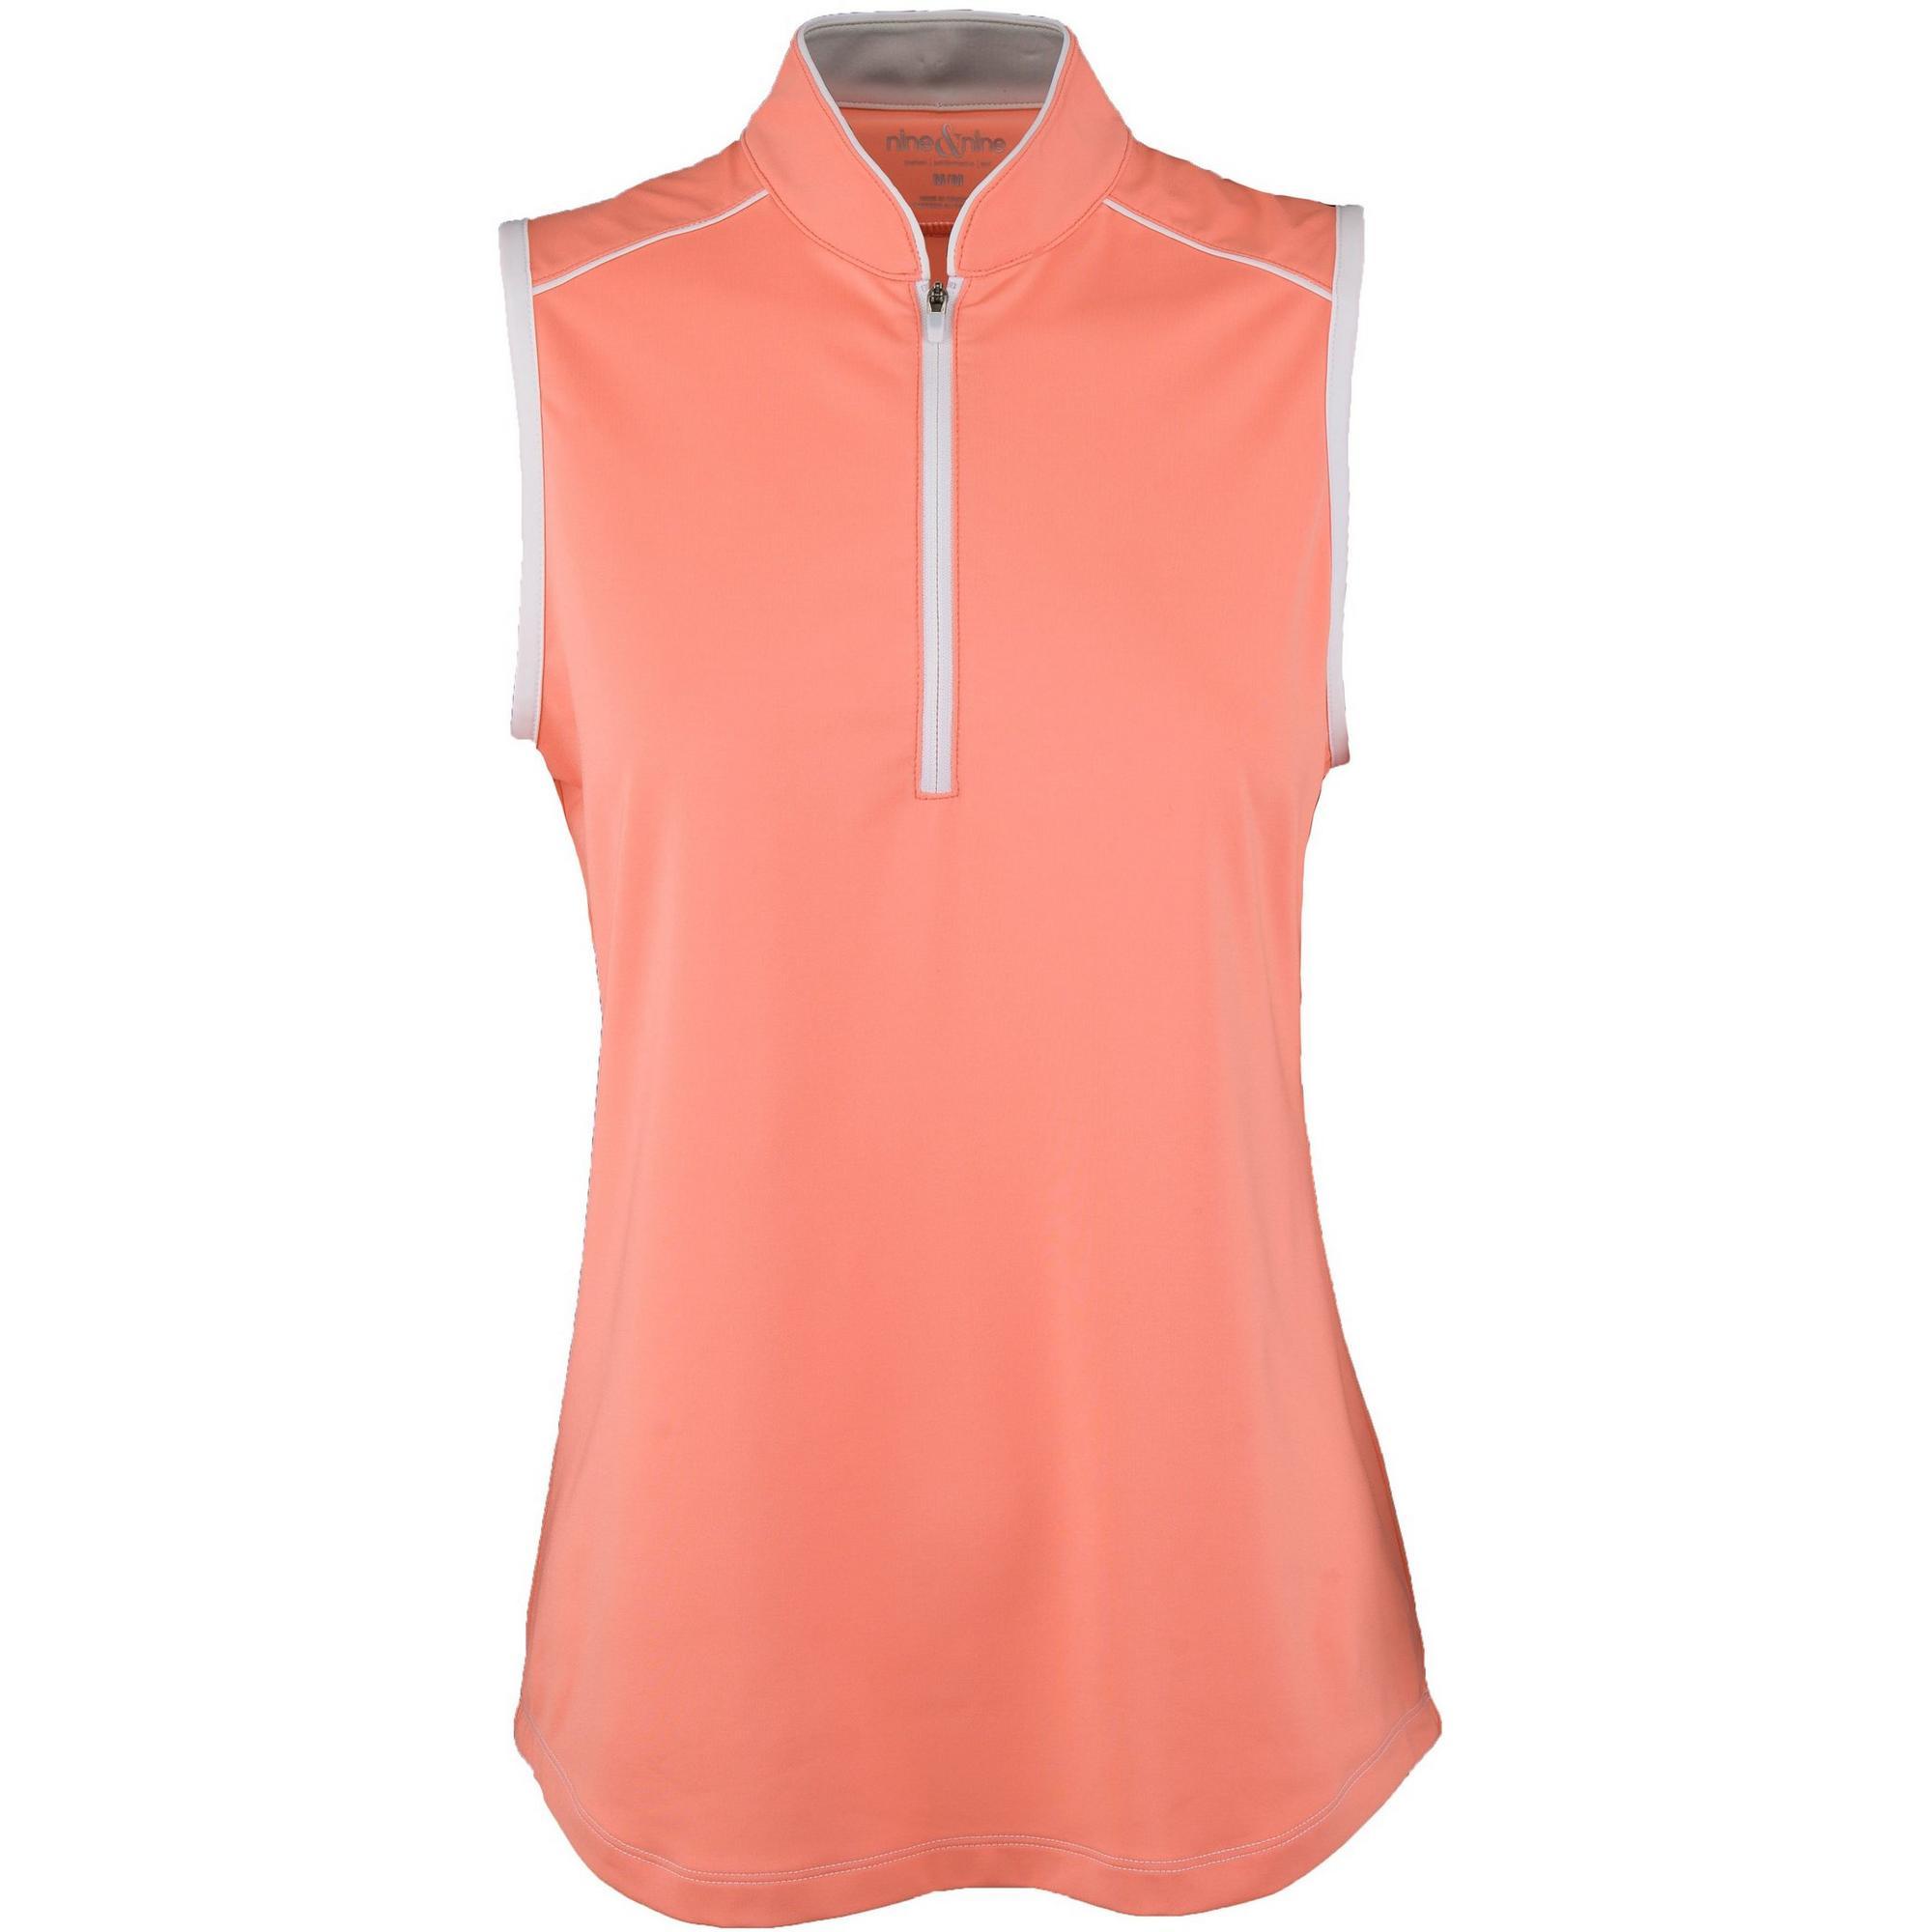 Women's Sleeveless Solid Mock Neck Top